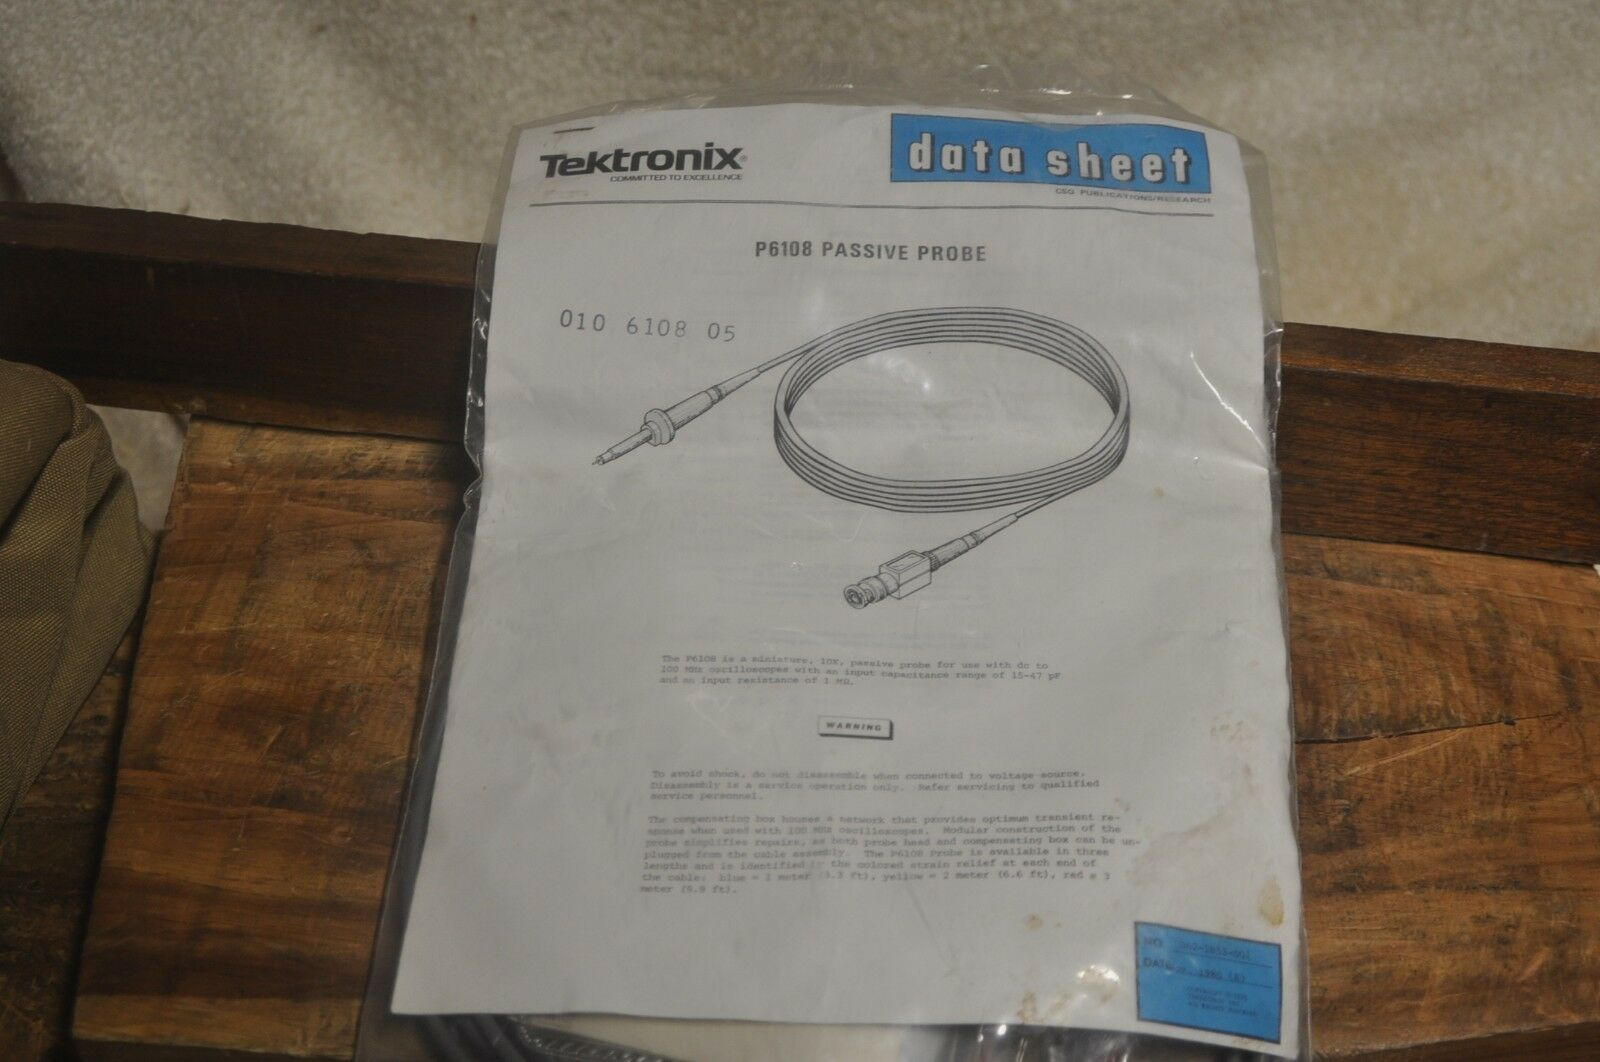 TEKTRONIX PROBE P6106 10X 13pF 10Mohm 2M...YELLOW...NO CLAMP.